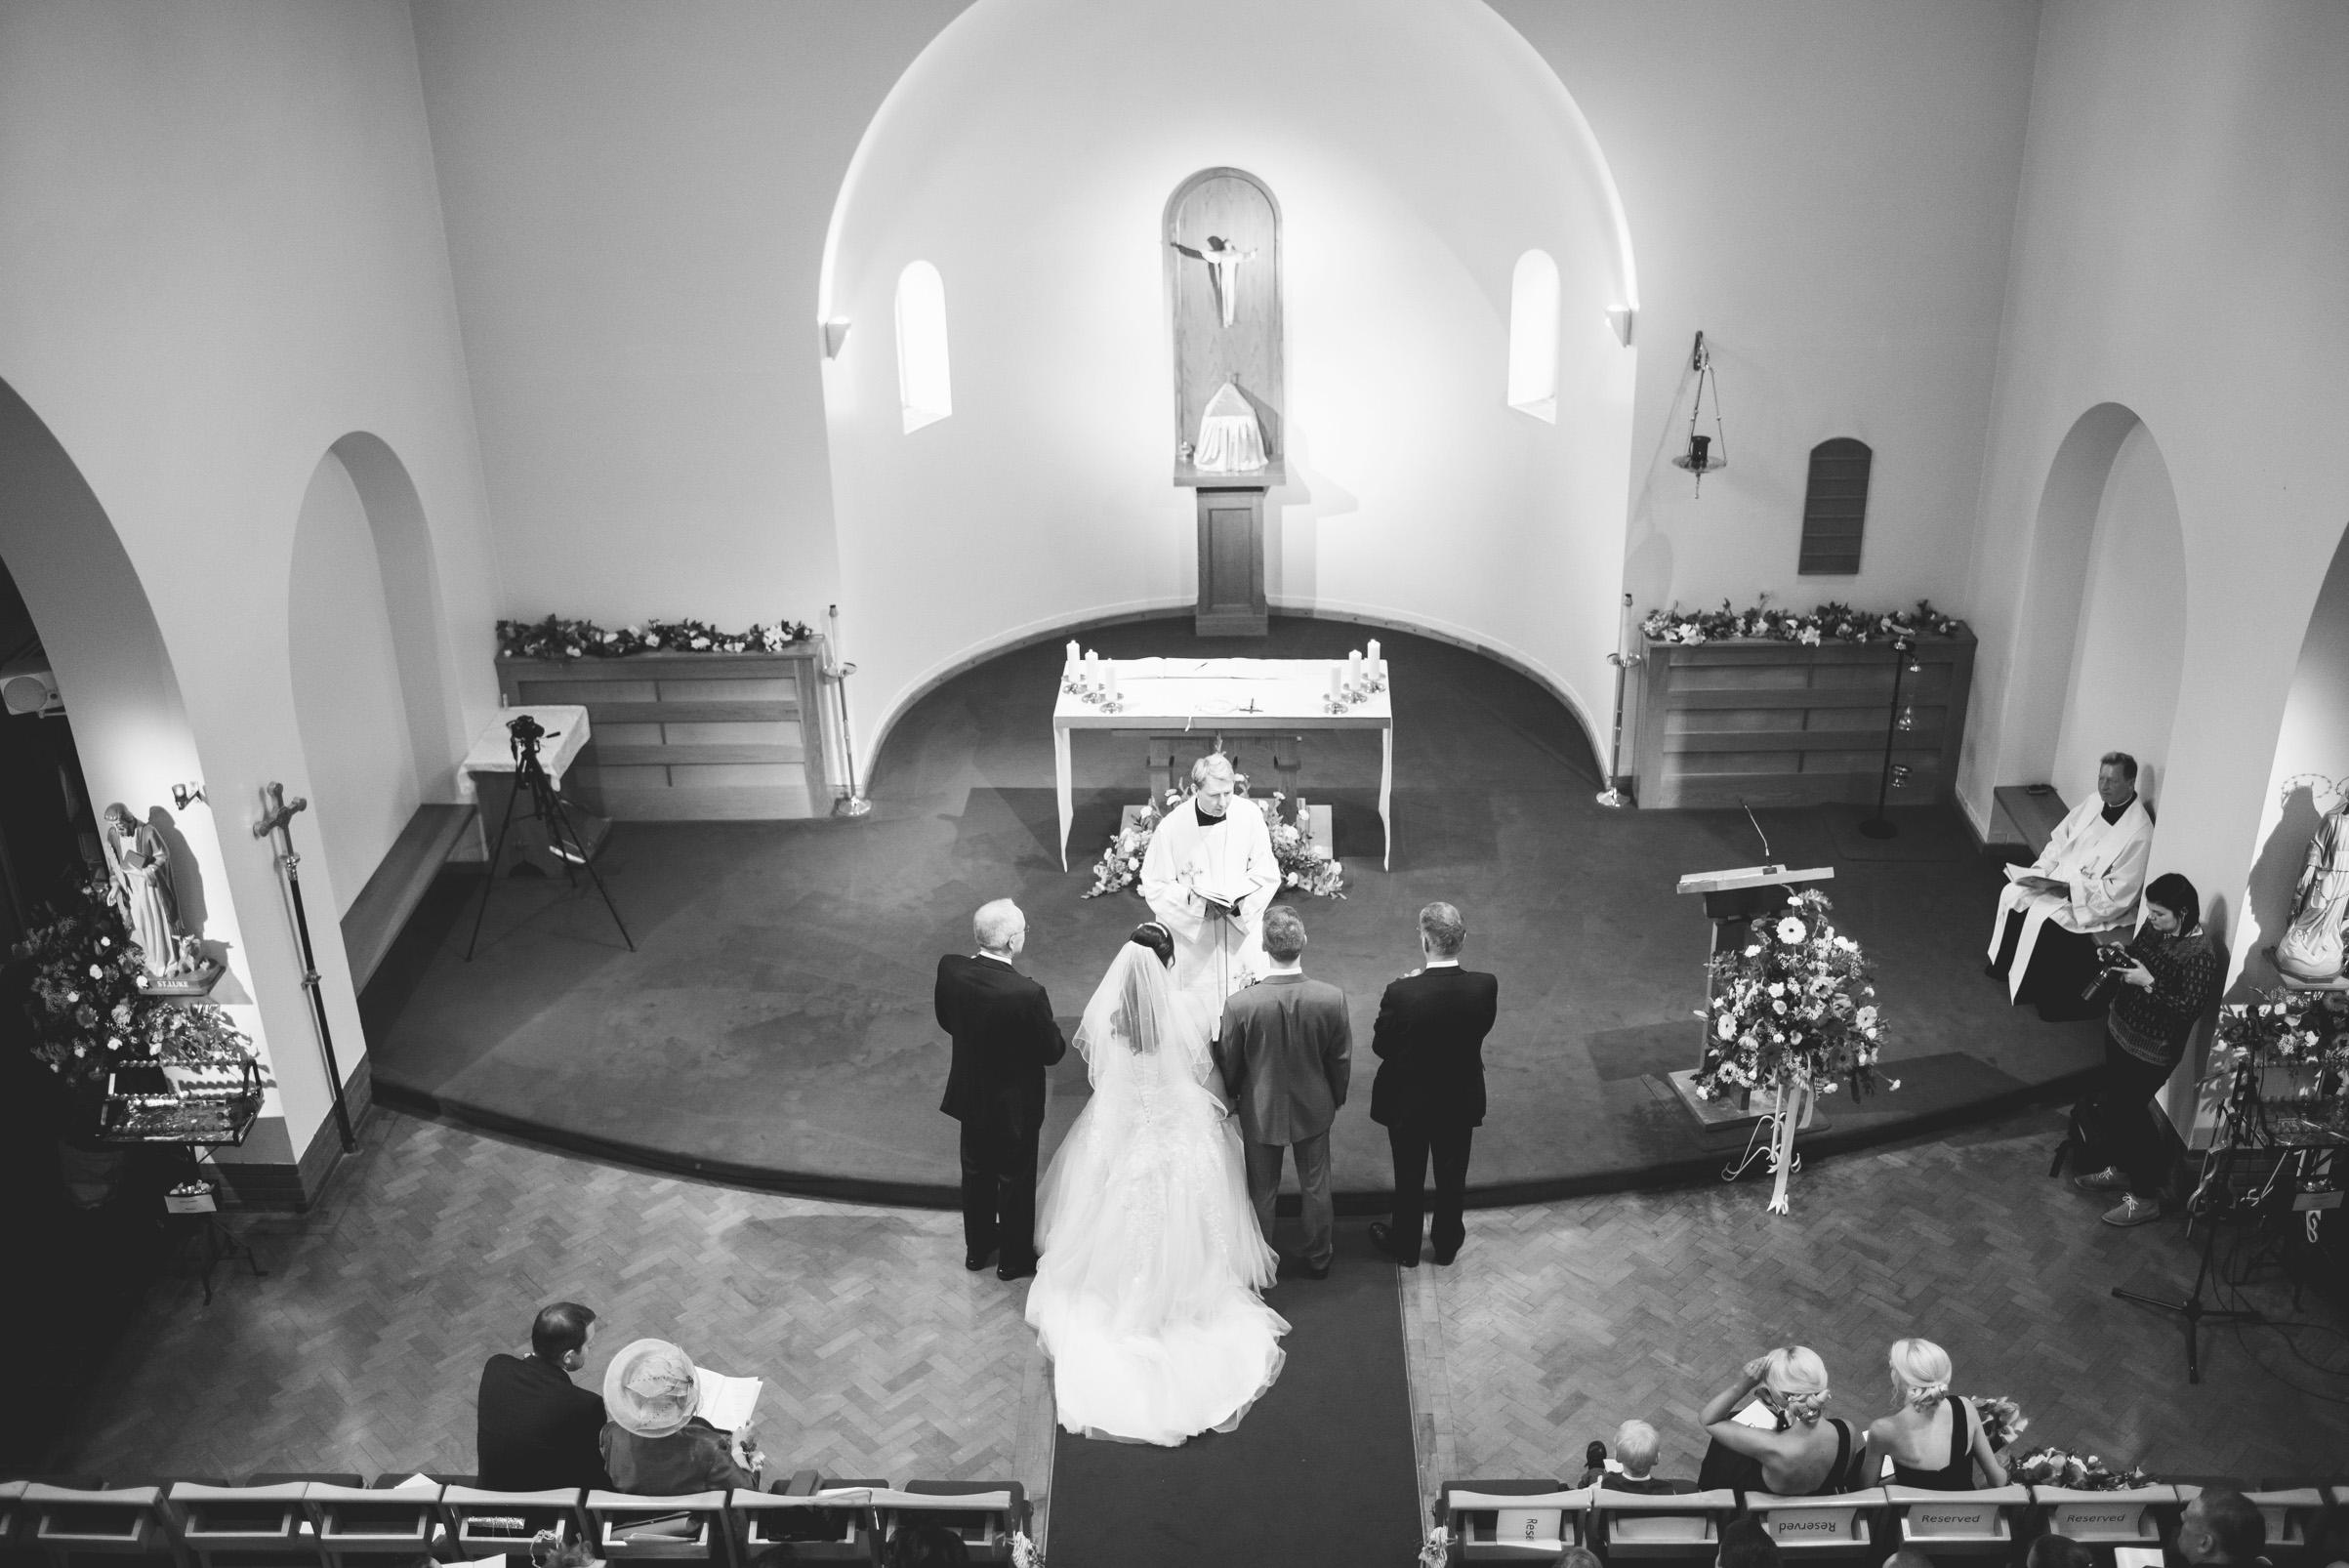 The+Fairlawns+wedding+Aldridge+StLukes+Church-88.jpg